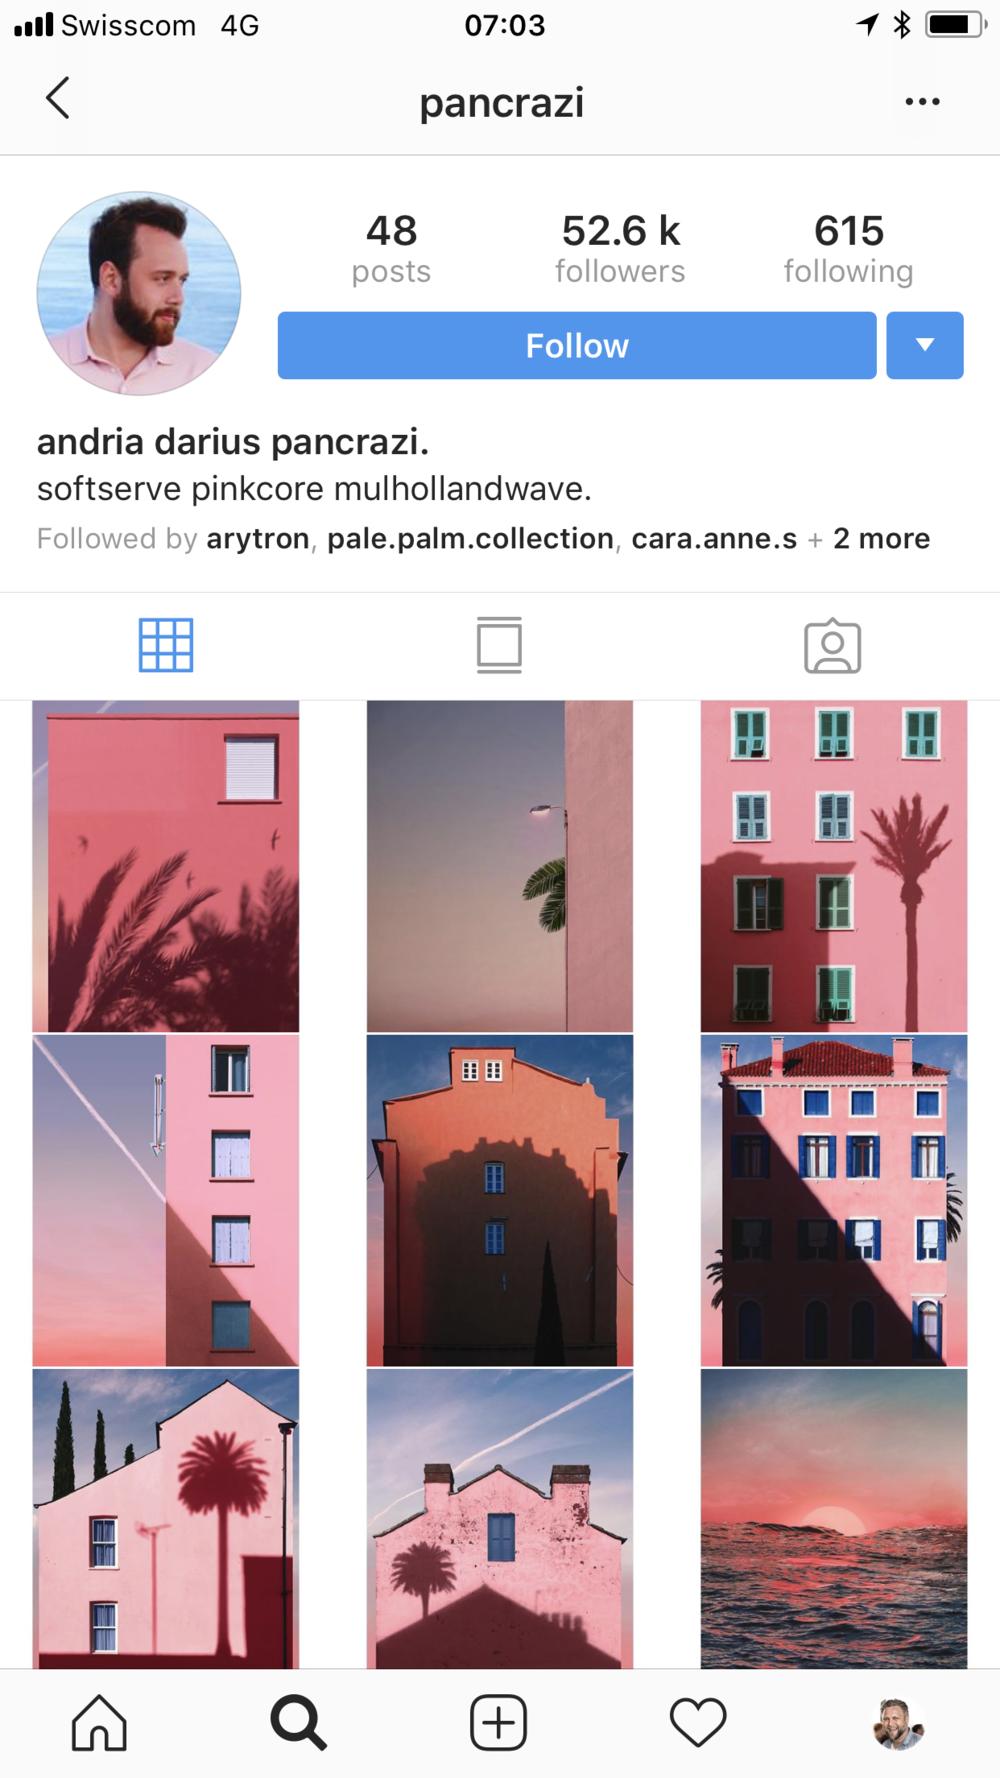 Dan_Roznov_Instagram_Storytelling_digitalEVENT2018_10.png